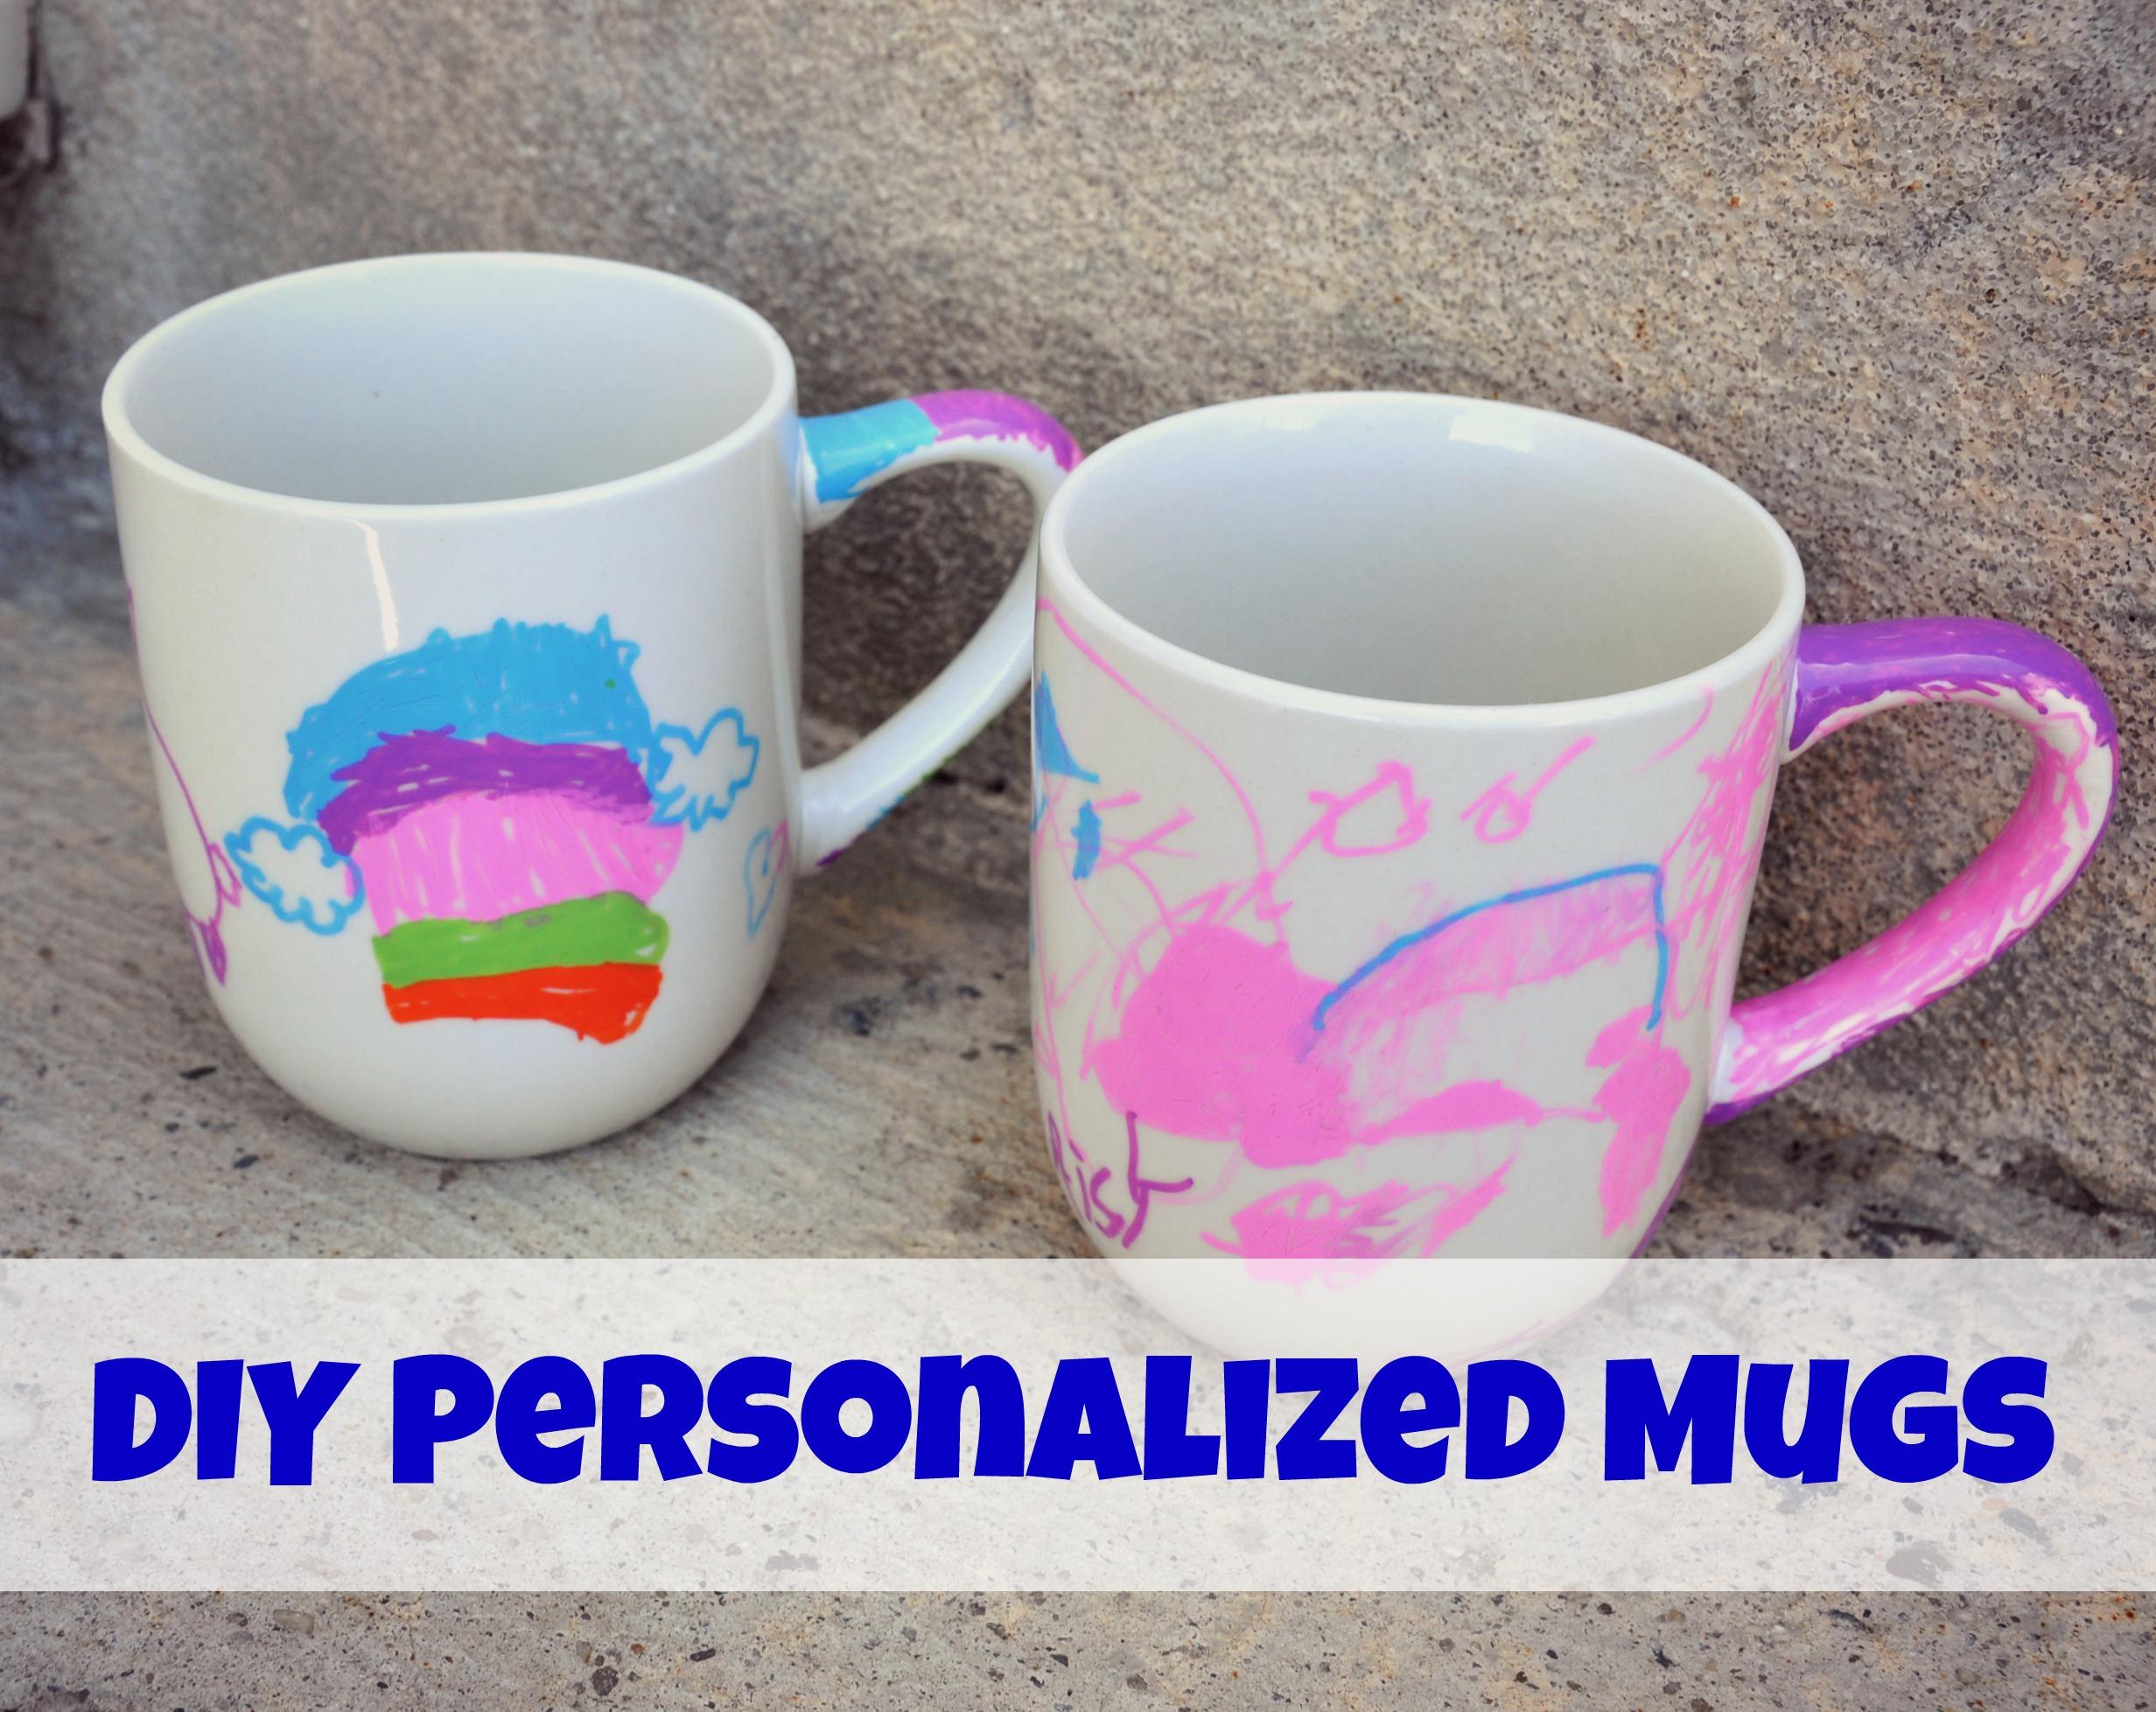 personalizedmugs